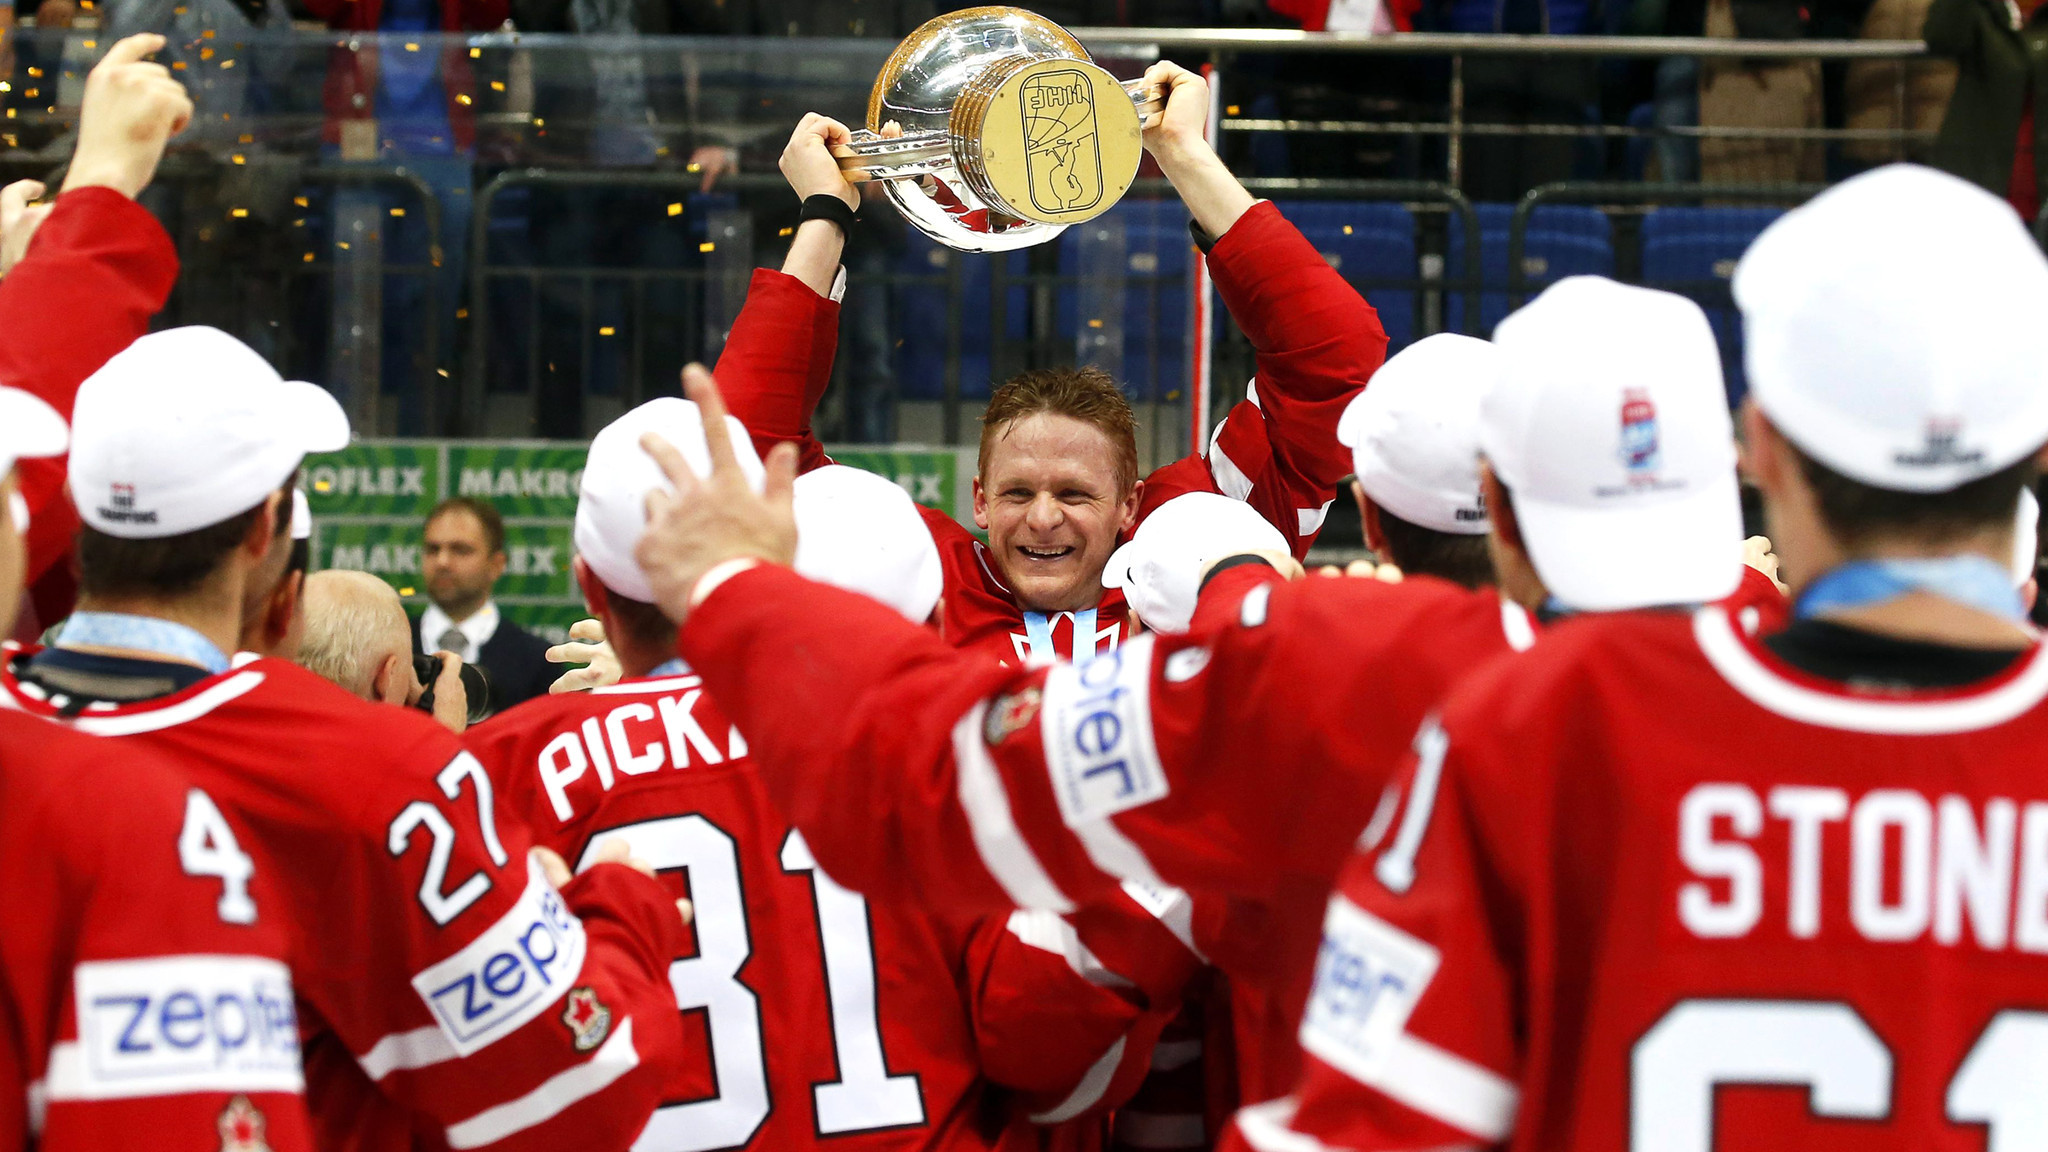 La-sp-world-ice-hockey-championship-20160523